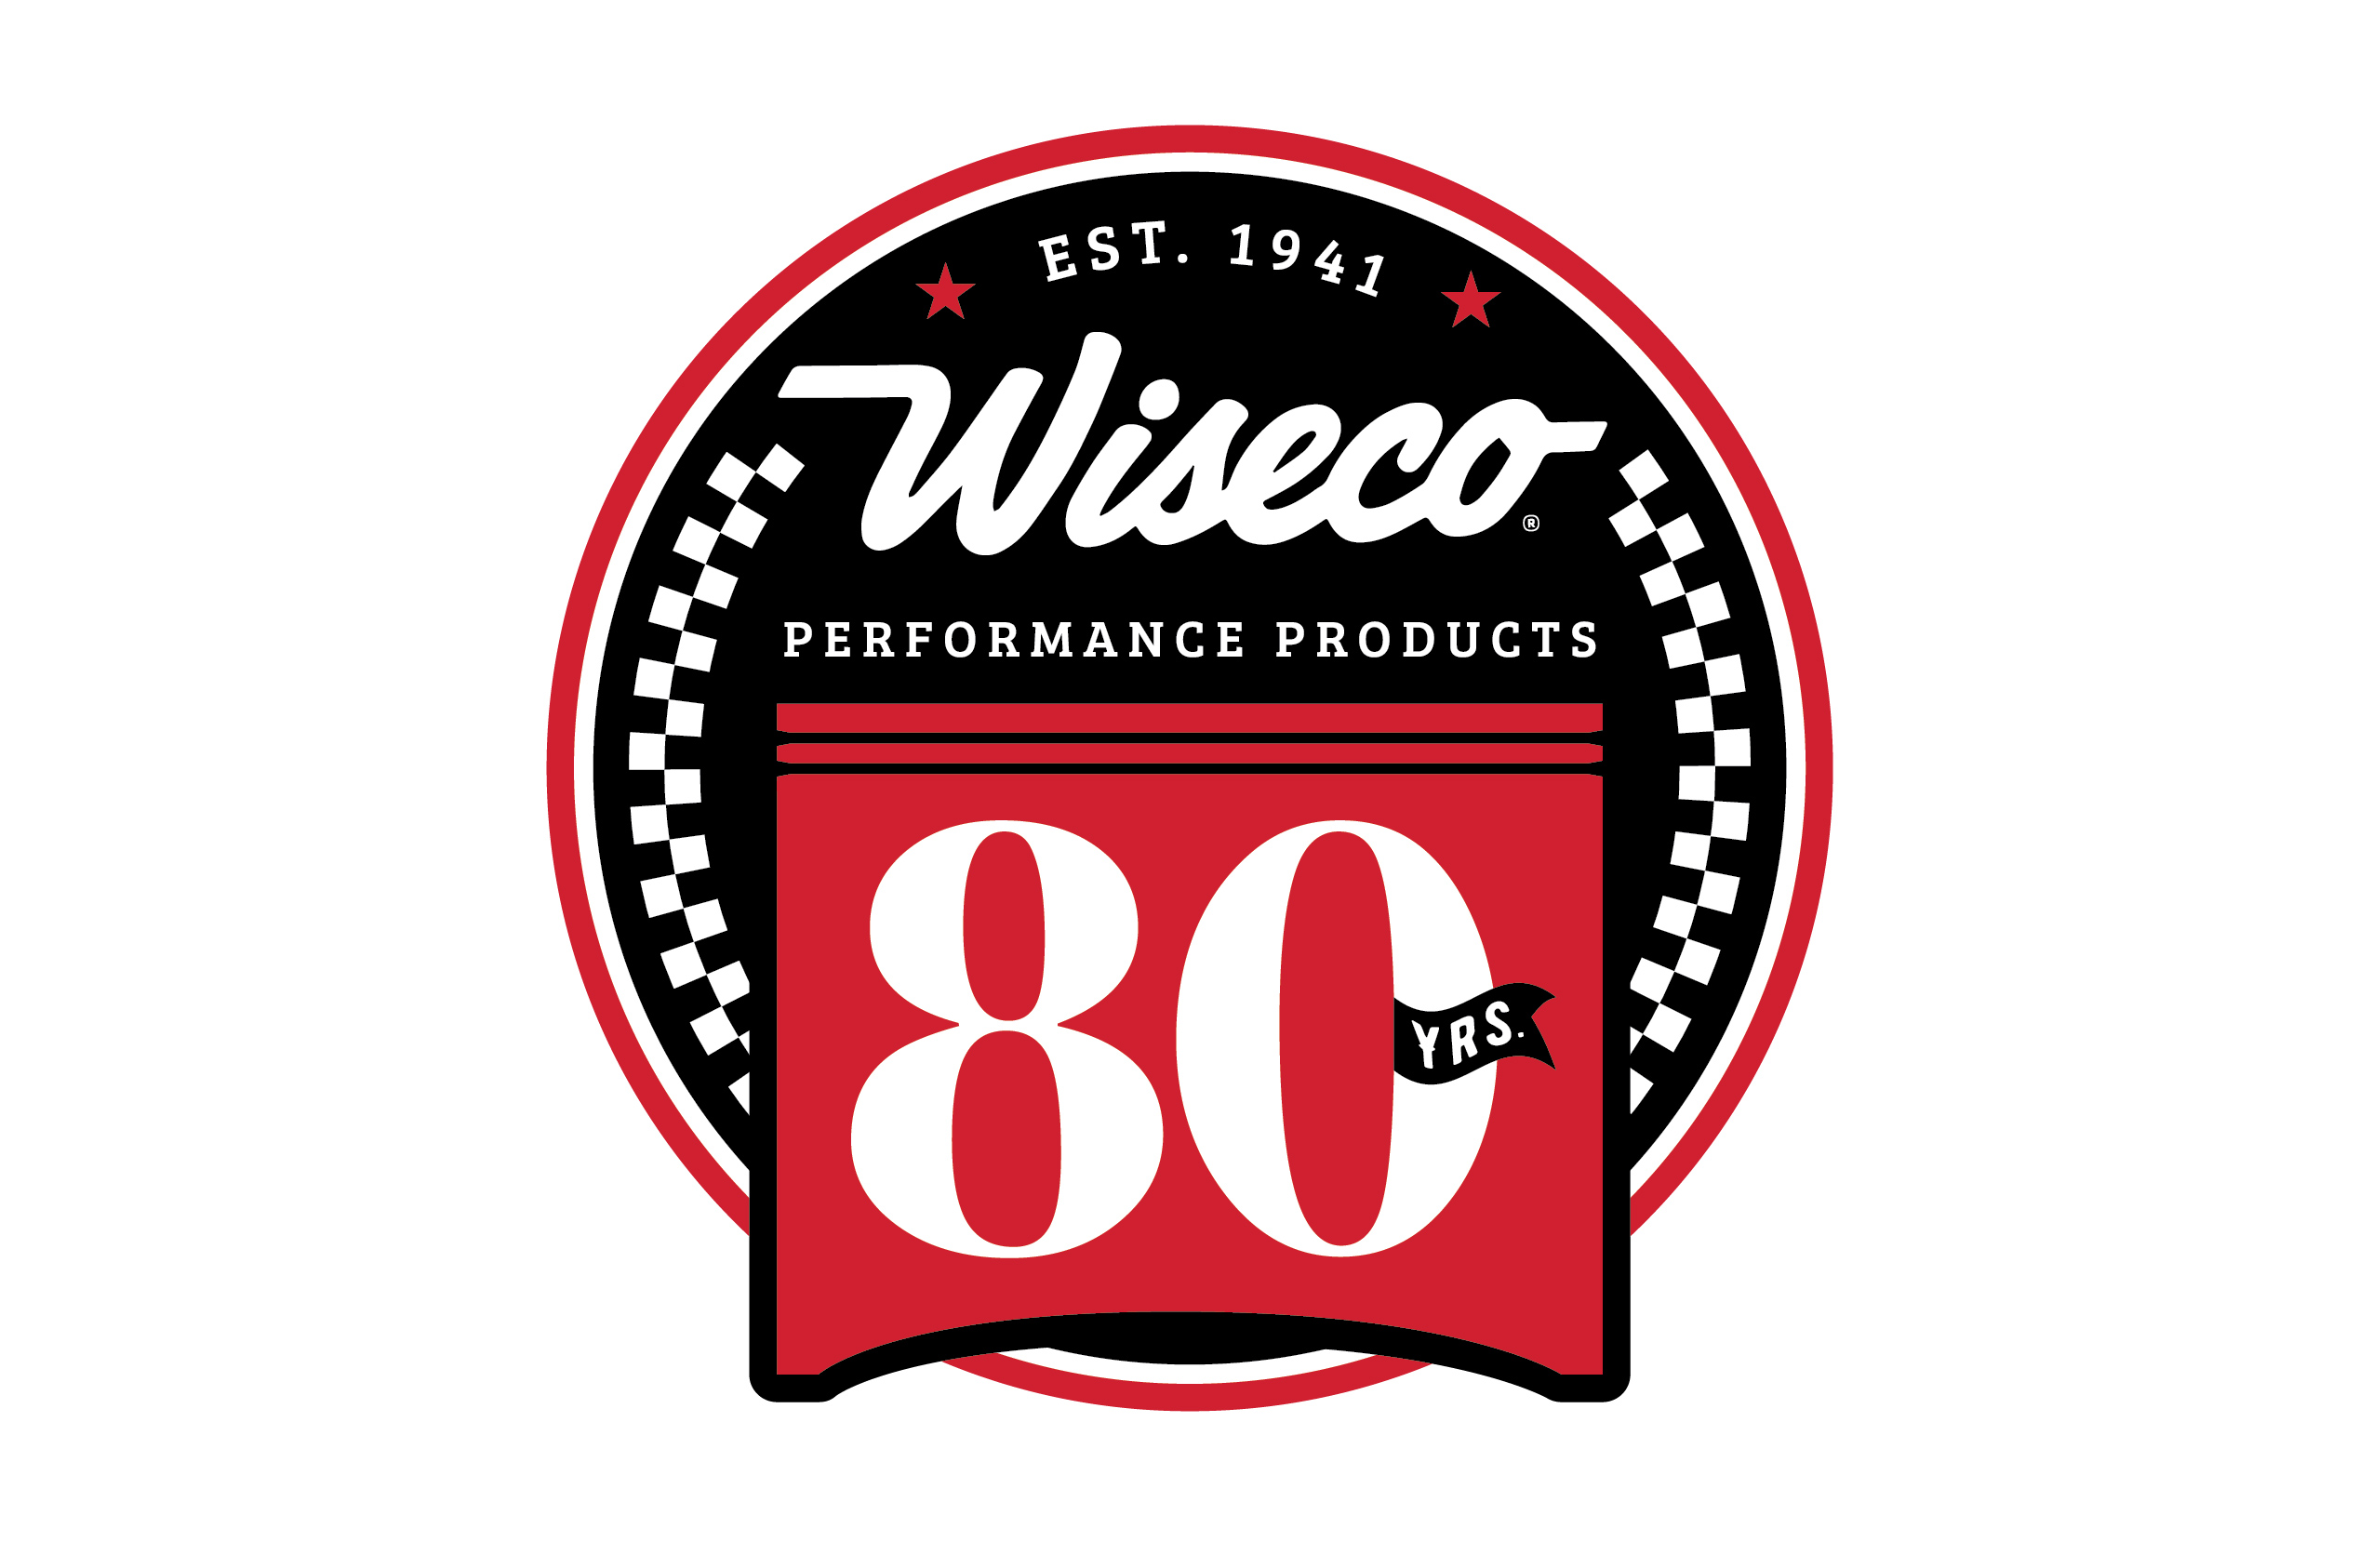 Wiseco 80th Anniversary Logo